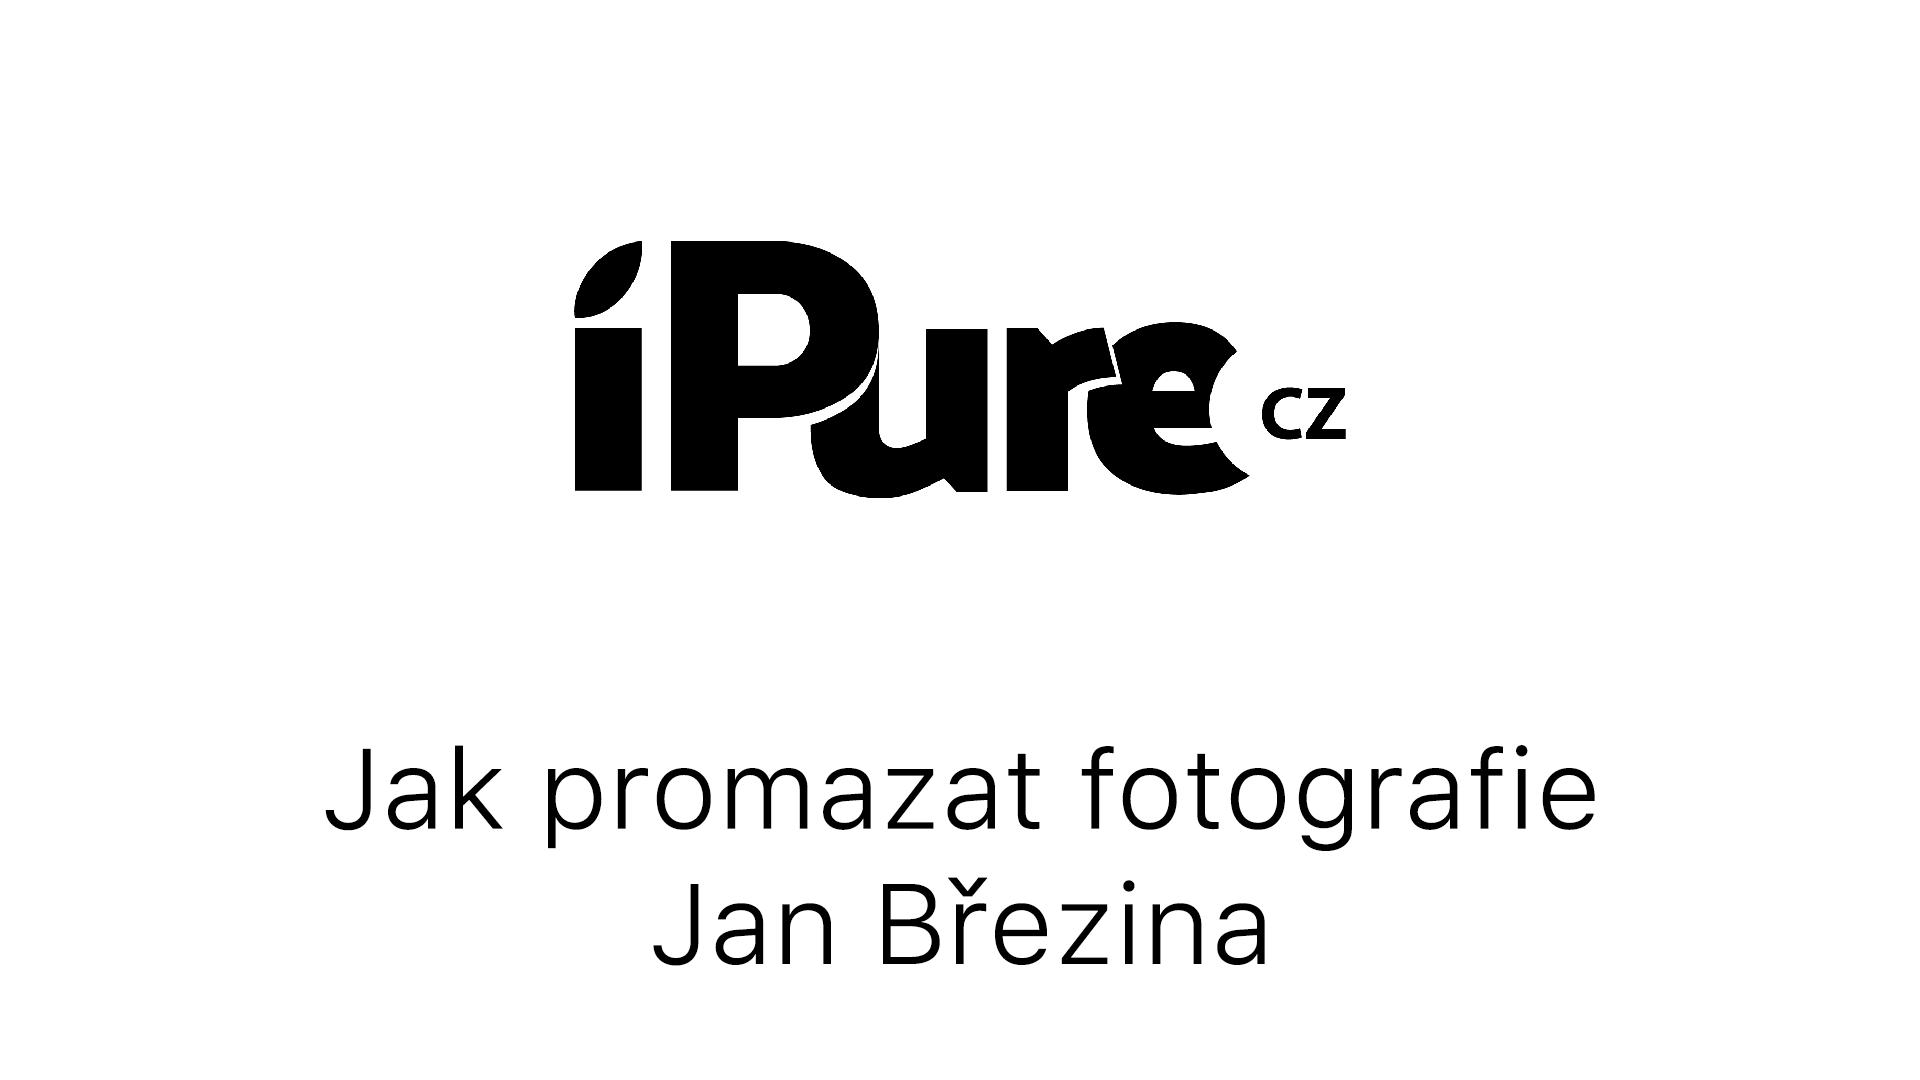 Jak promazat fotografie